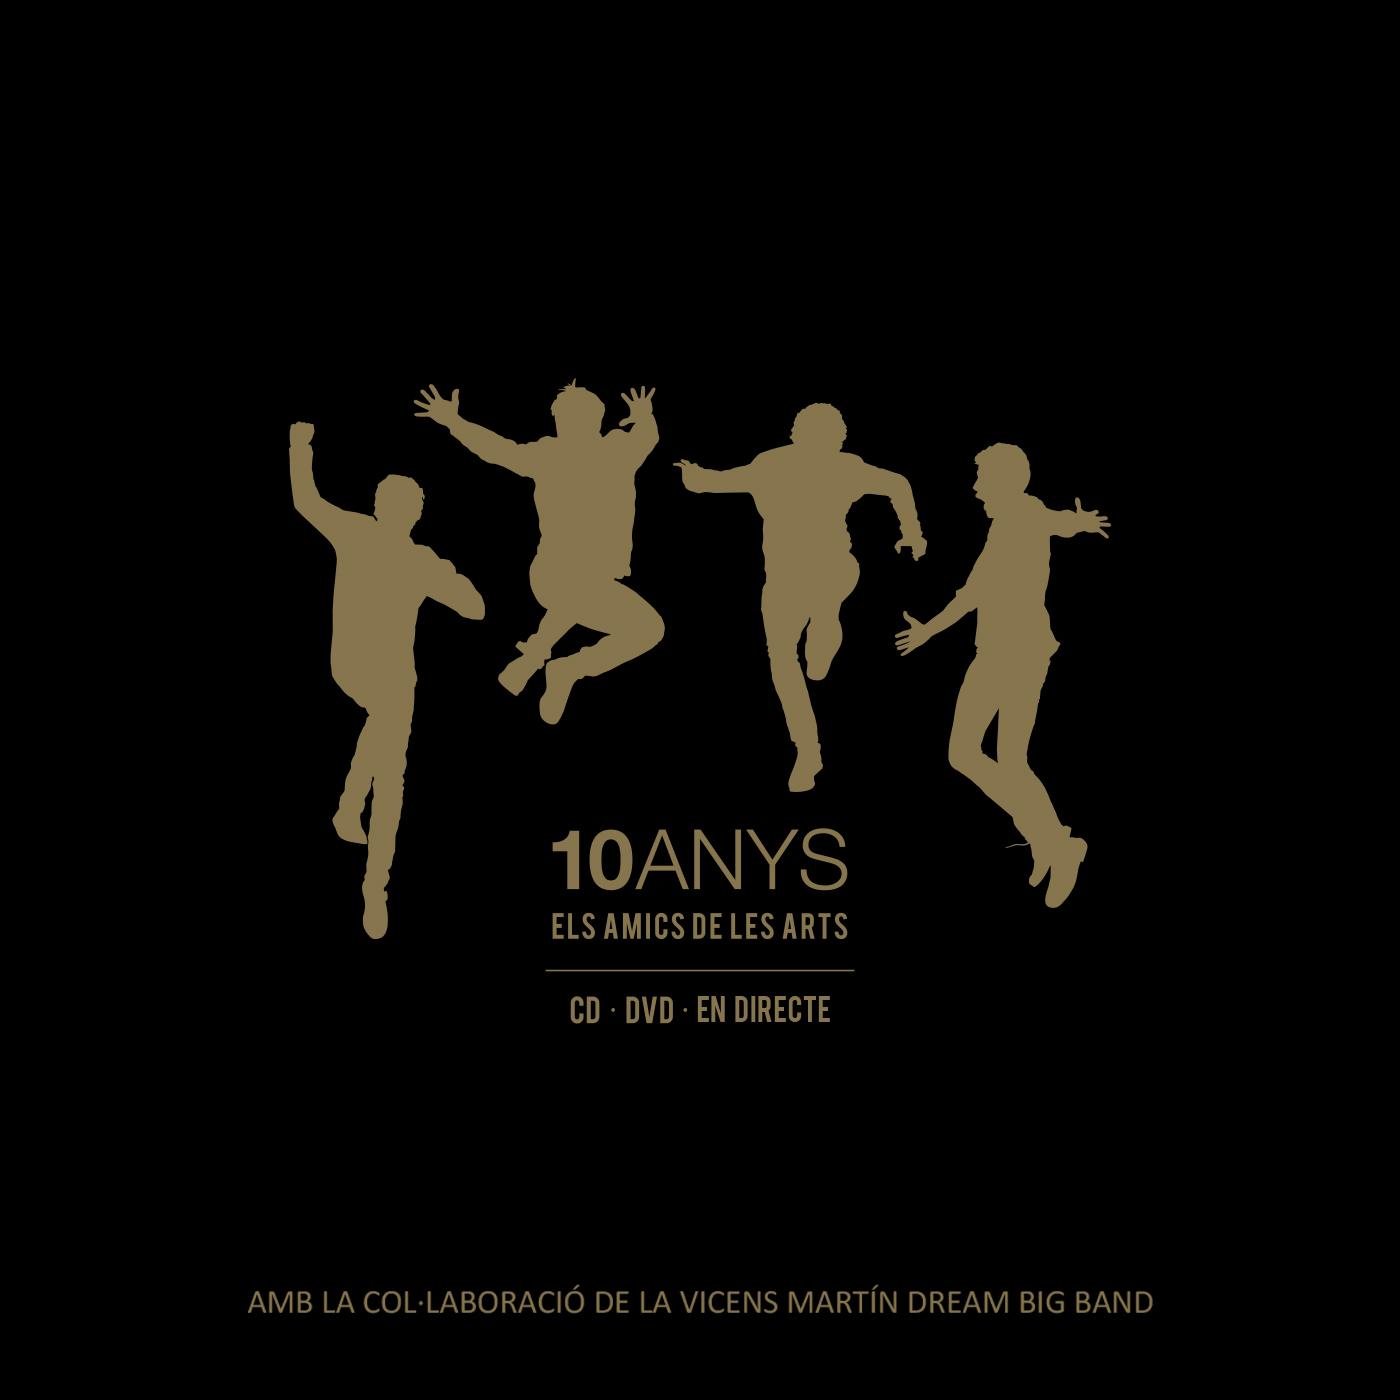 10 anys